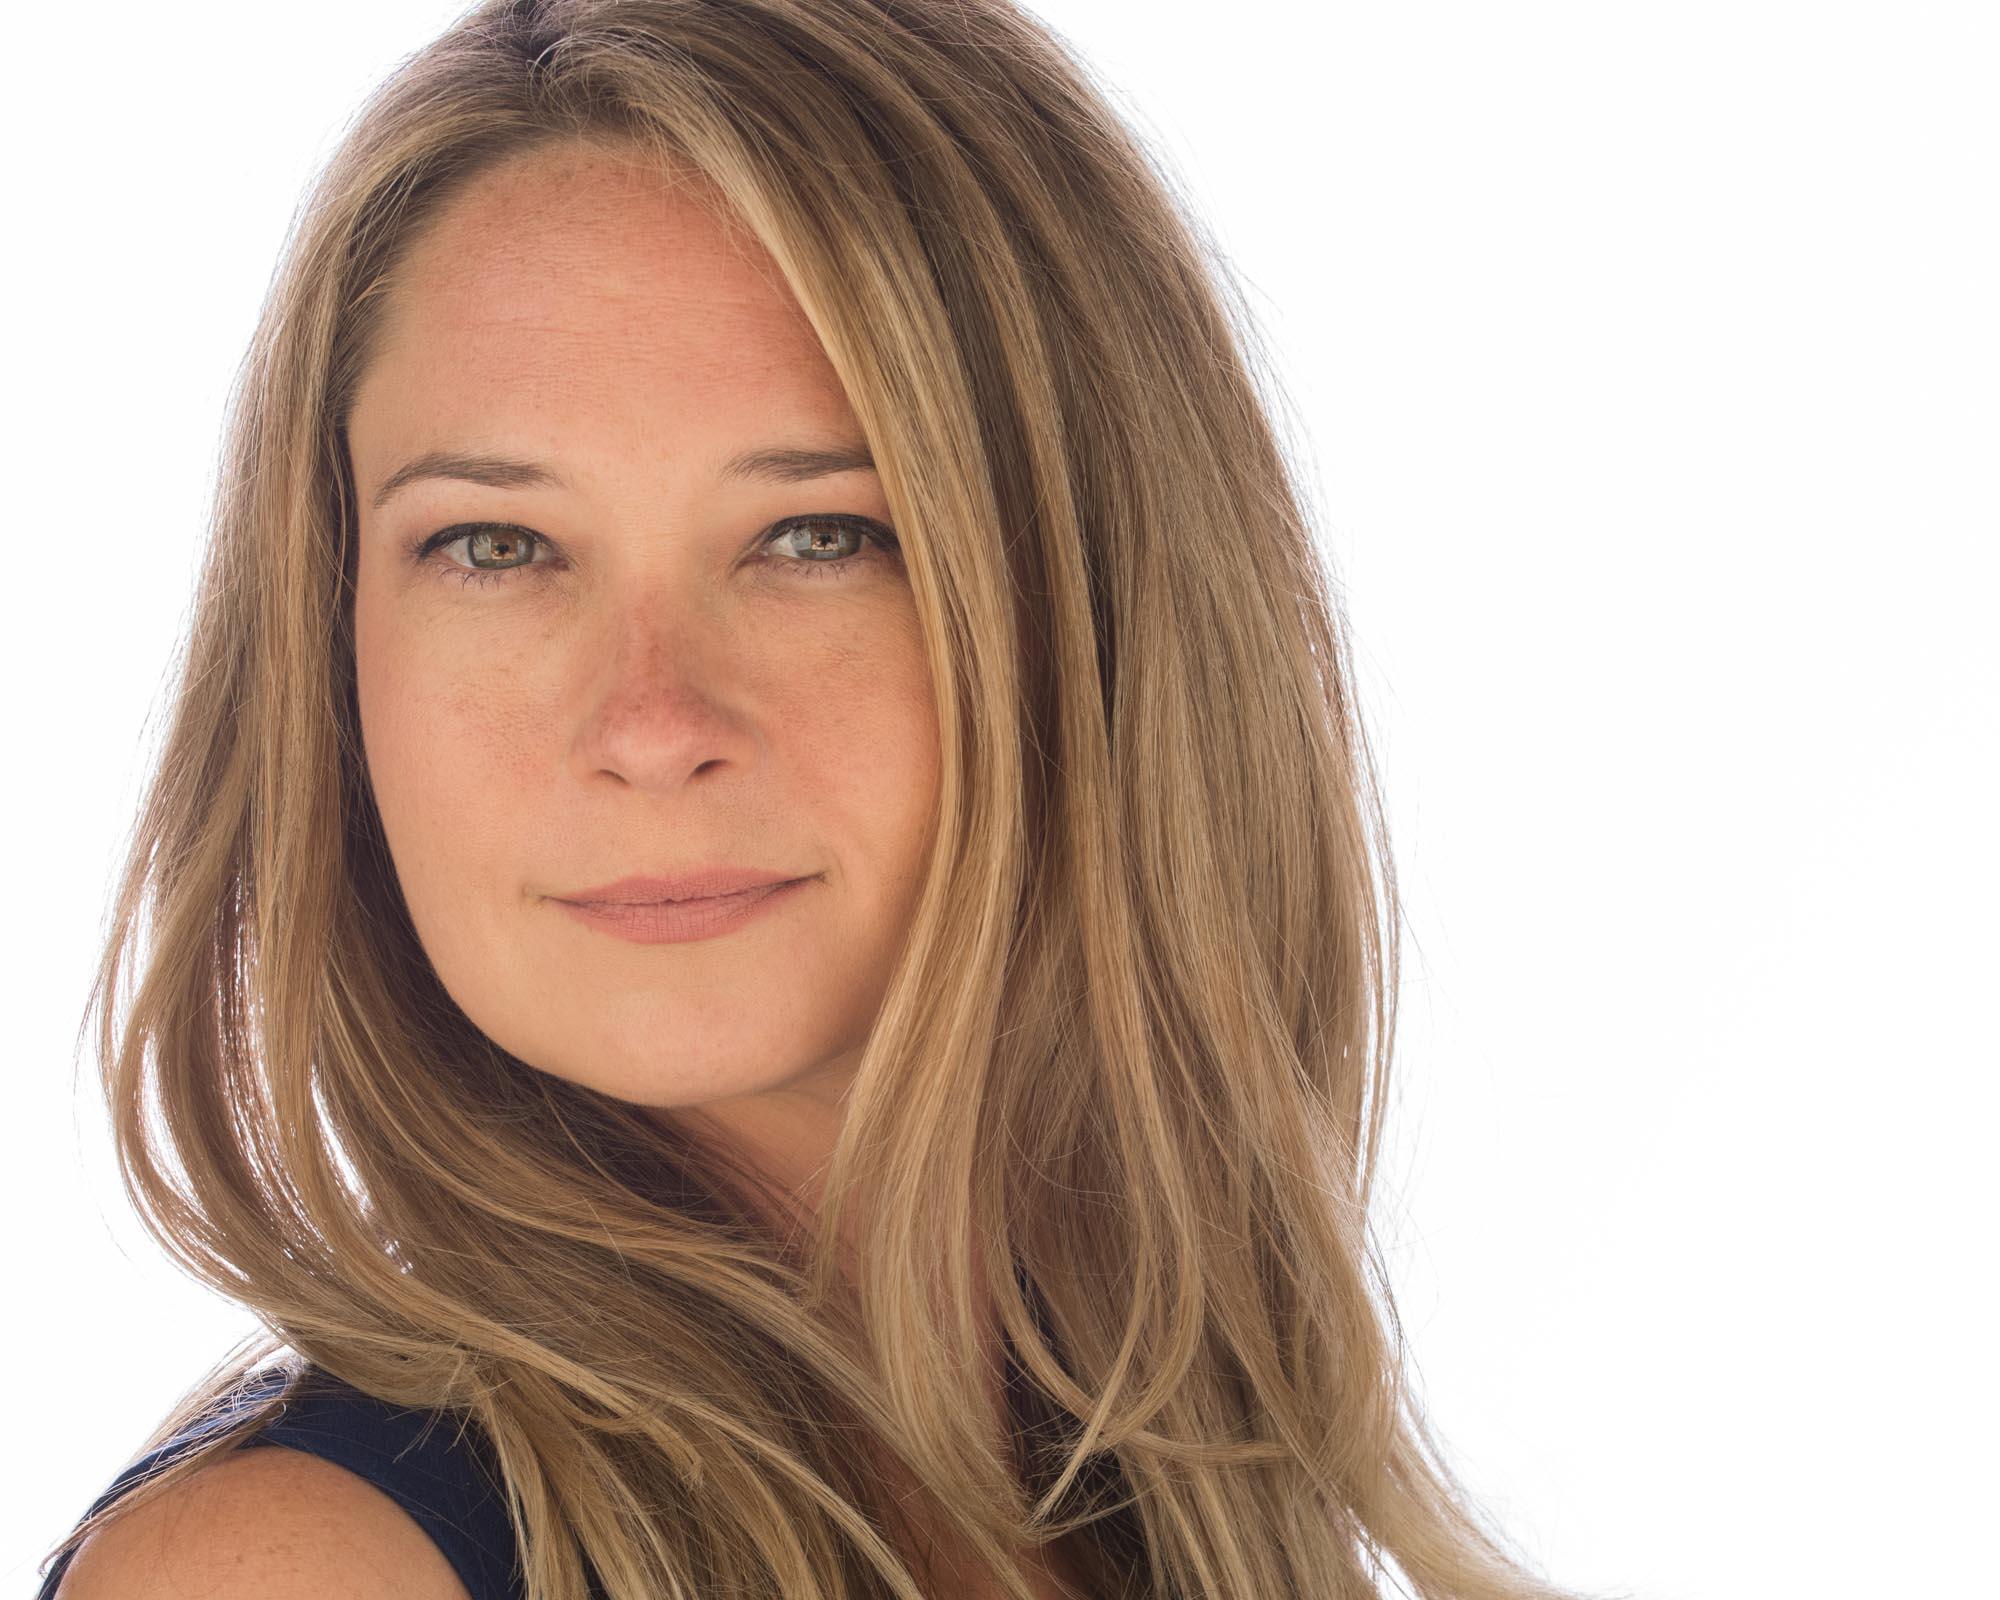 150717 Pfeiffer Jessica-12635.jpg